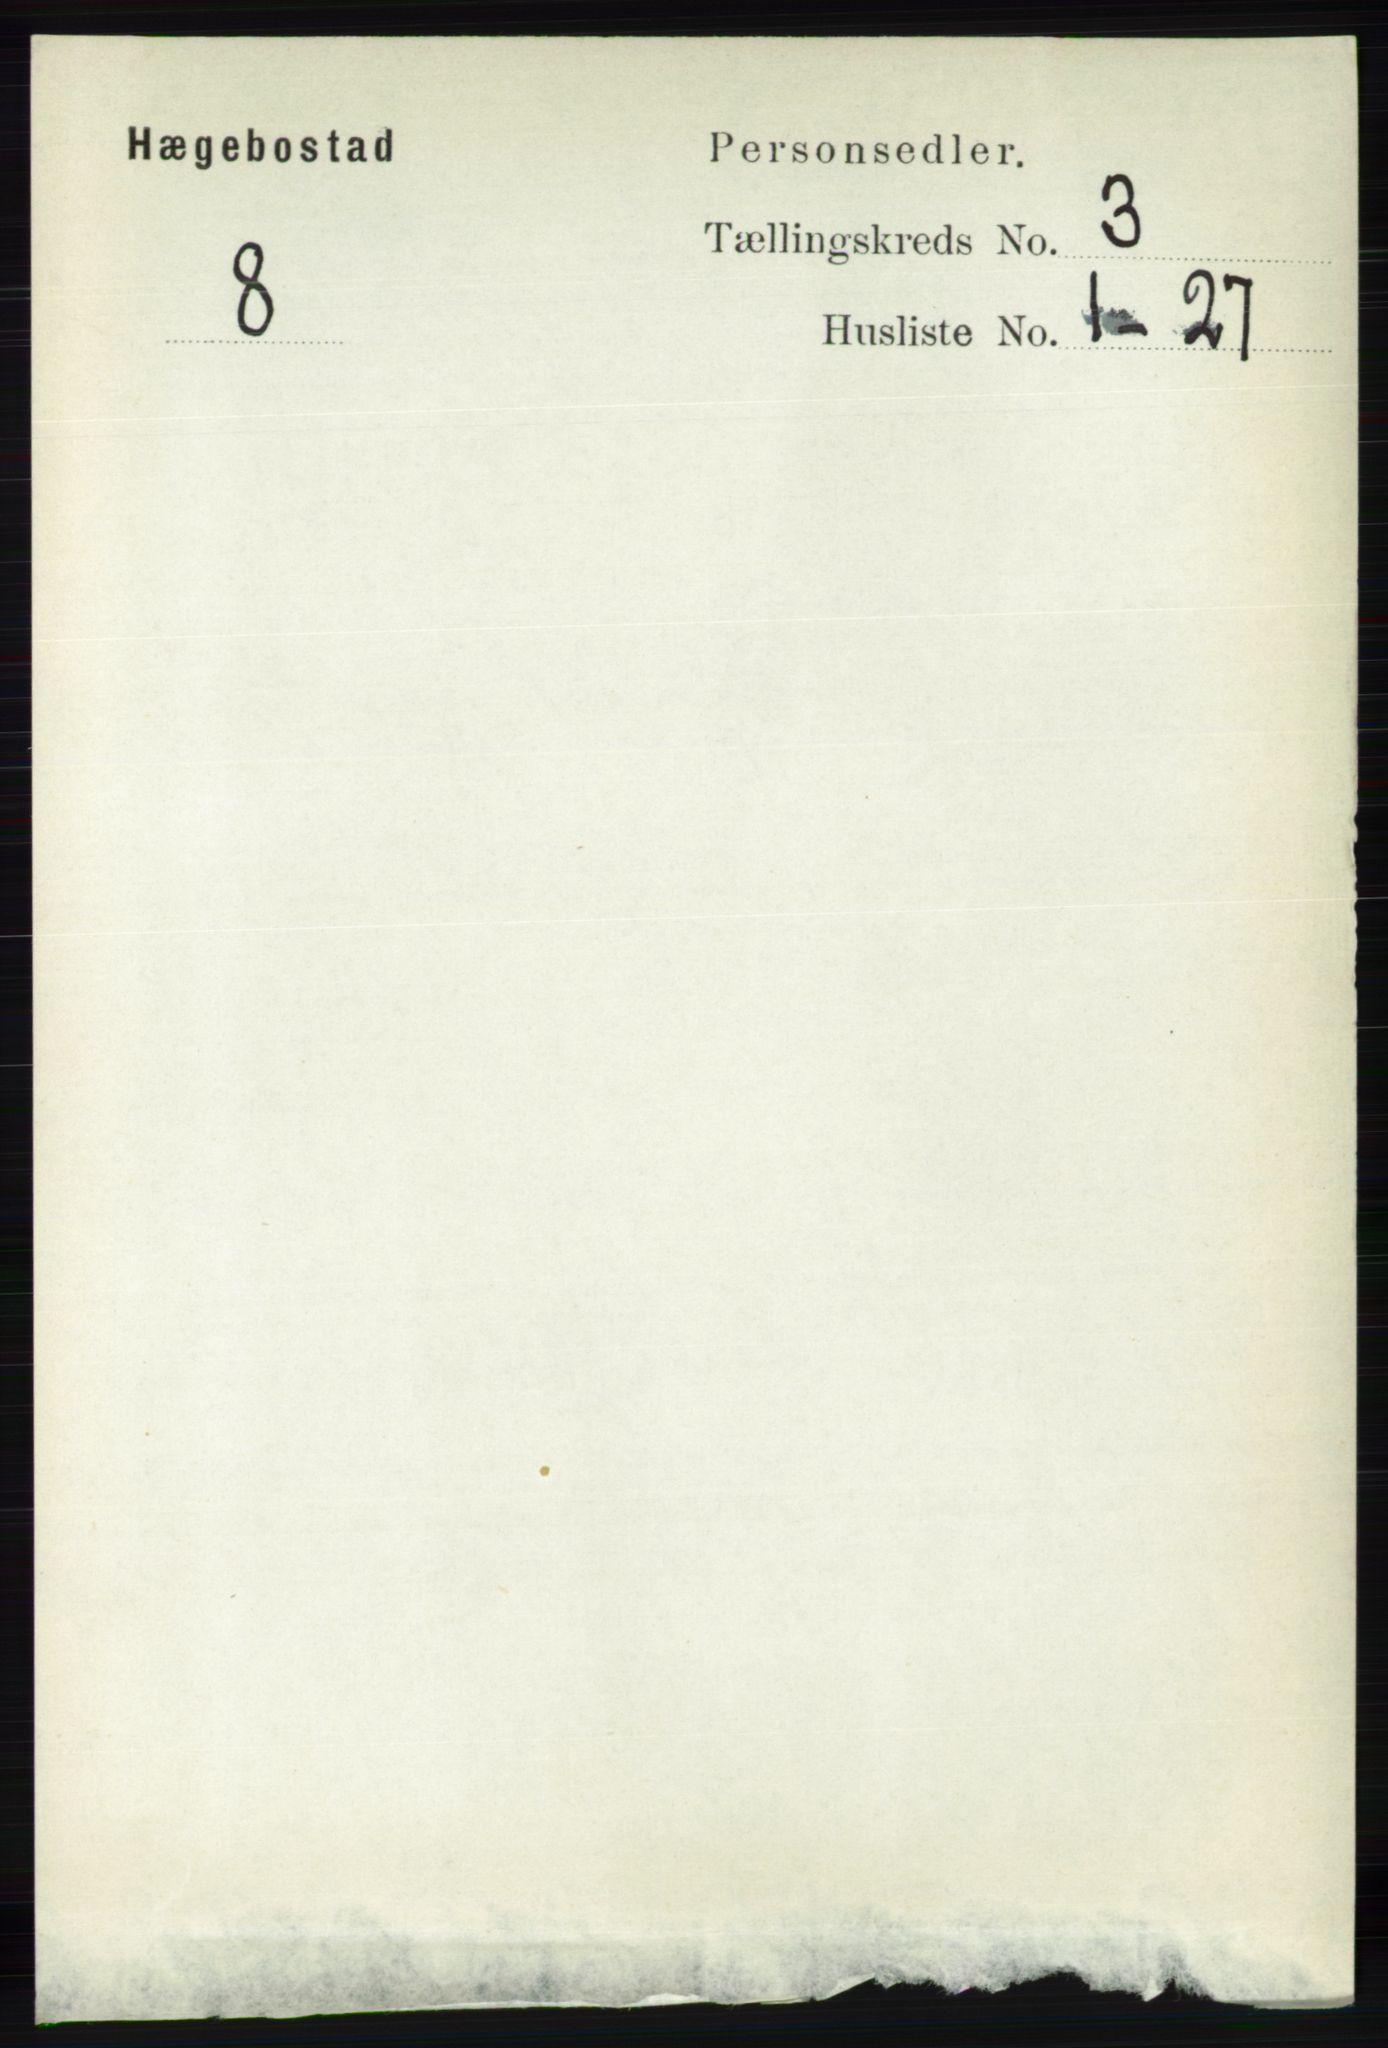 RA, Folketelling 1891 for 1034 Hægebostad herred, 1891, s. 875